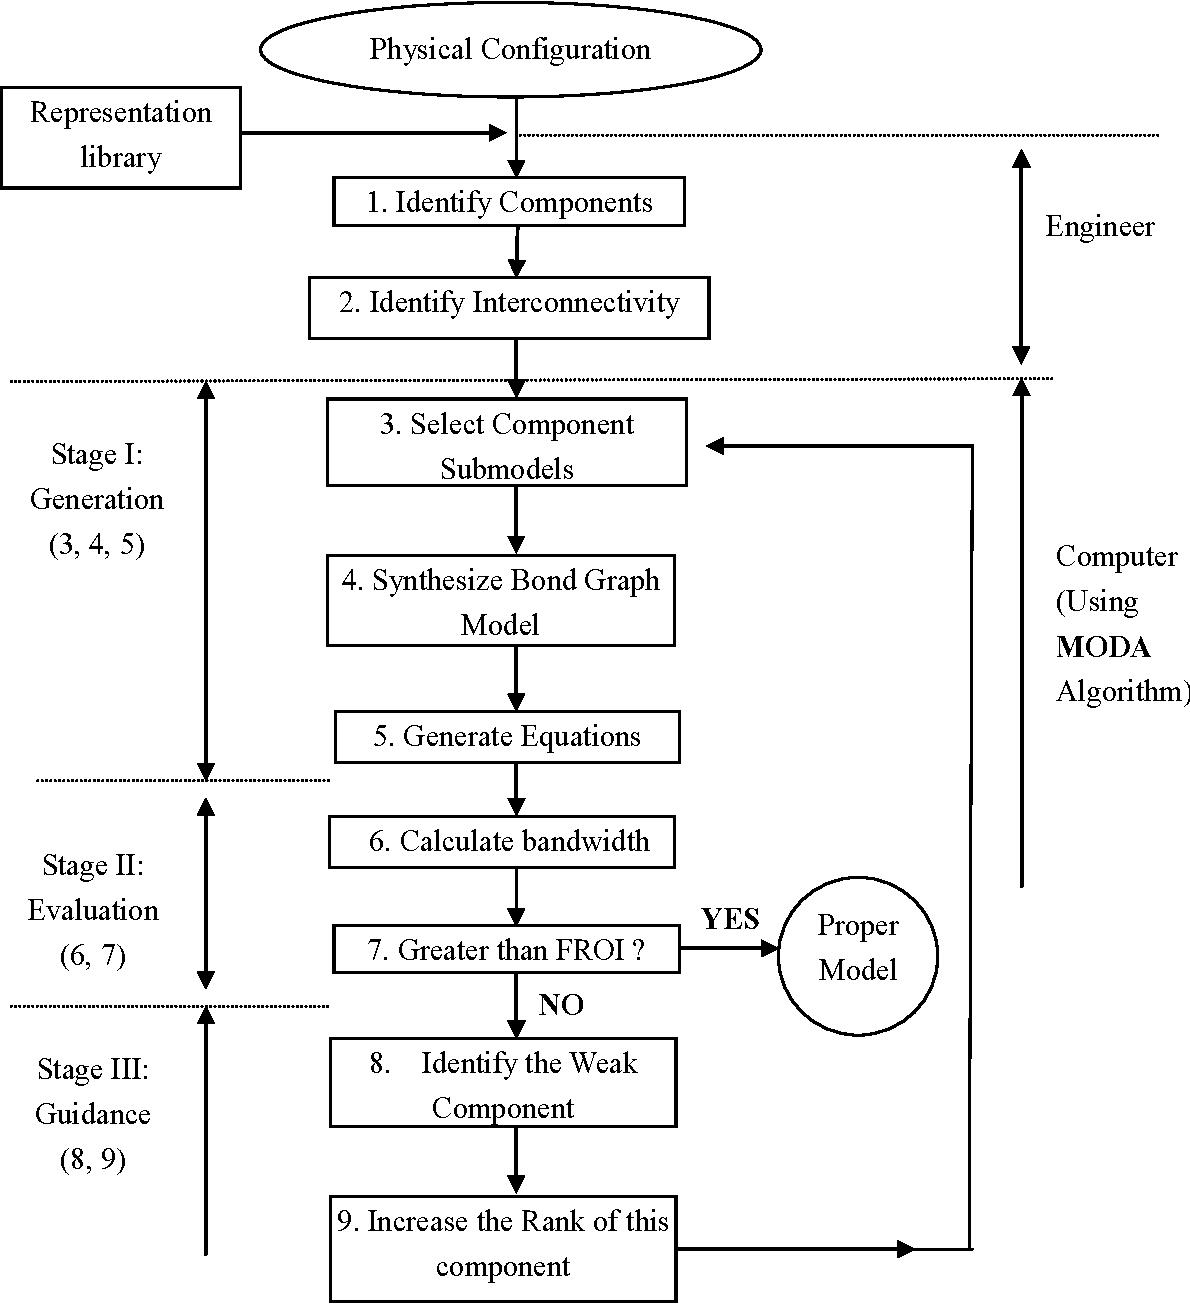 Figure 5-2: The scheme of modeling automation using MODA algorithm